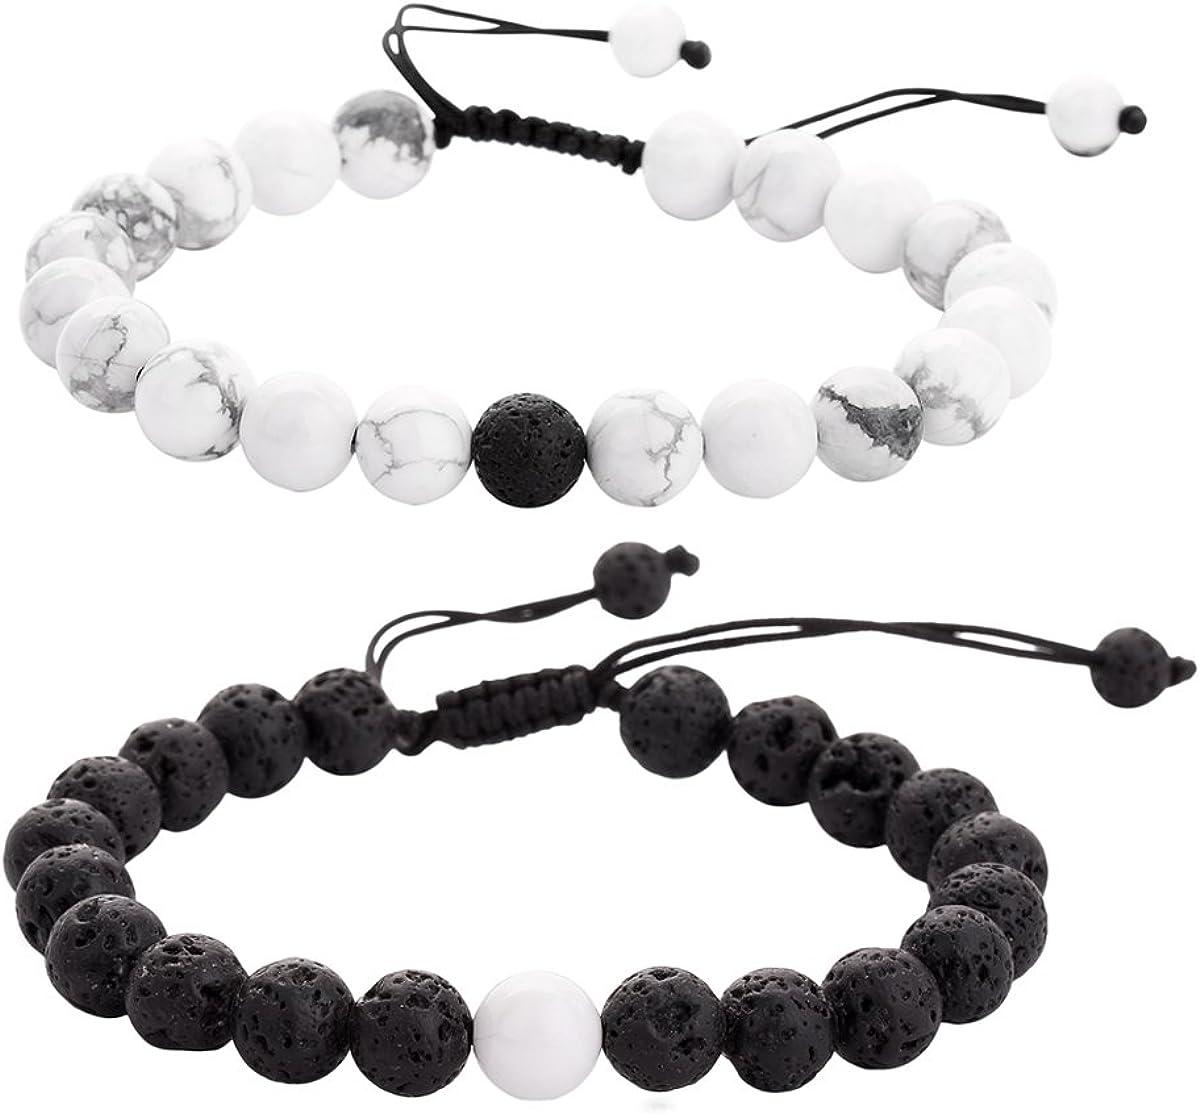 Healing Crystal Bracelet Boho Bracelets Rose Quartz Lepidolite Hematite Bracelet Stack Set of 3 Stretchy Bracelets Gemstone Bracelet